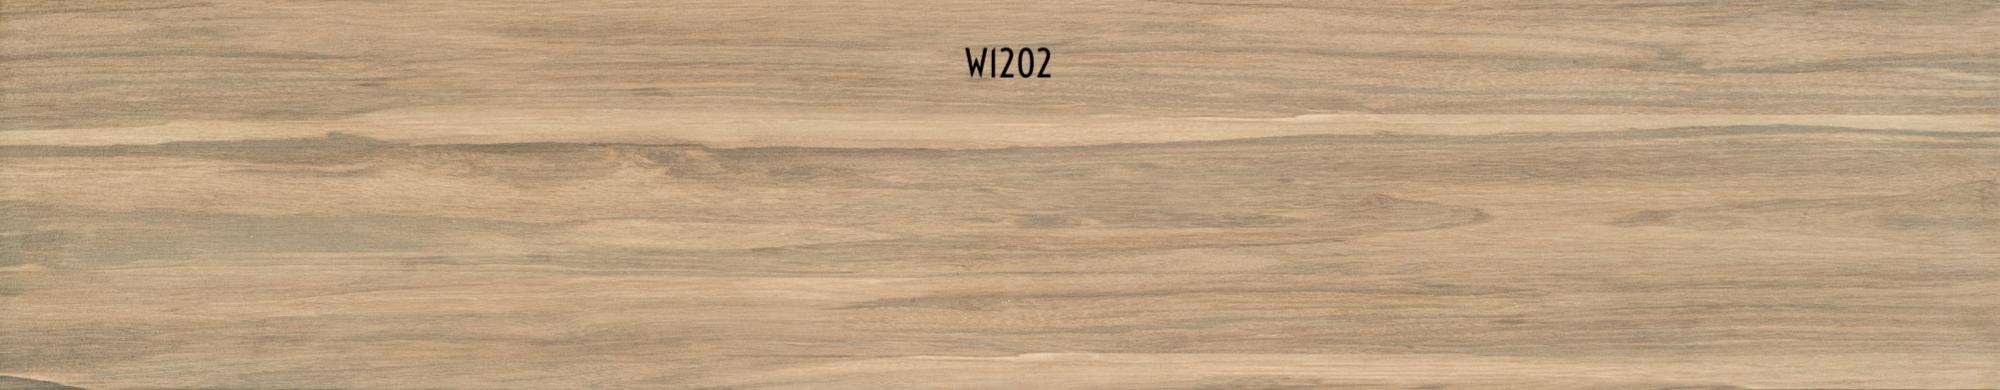 W1202